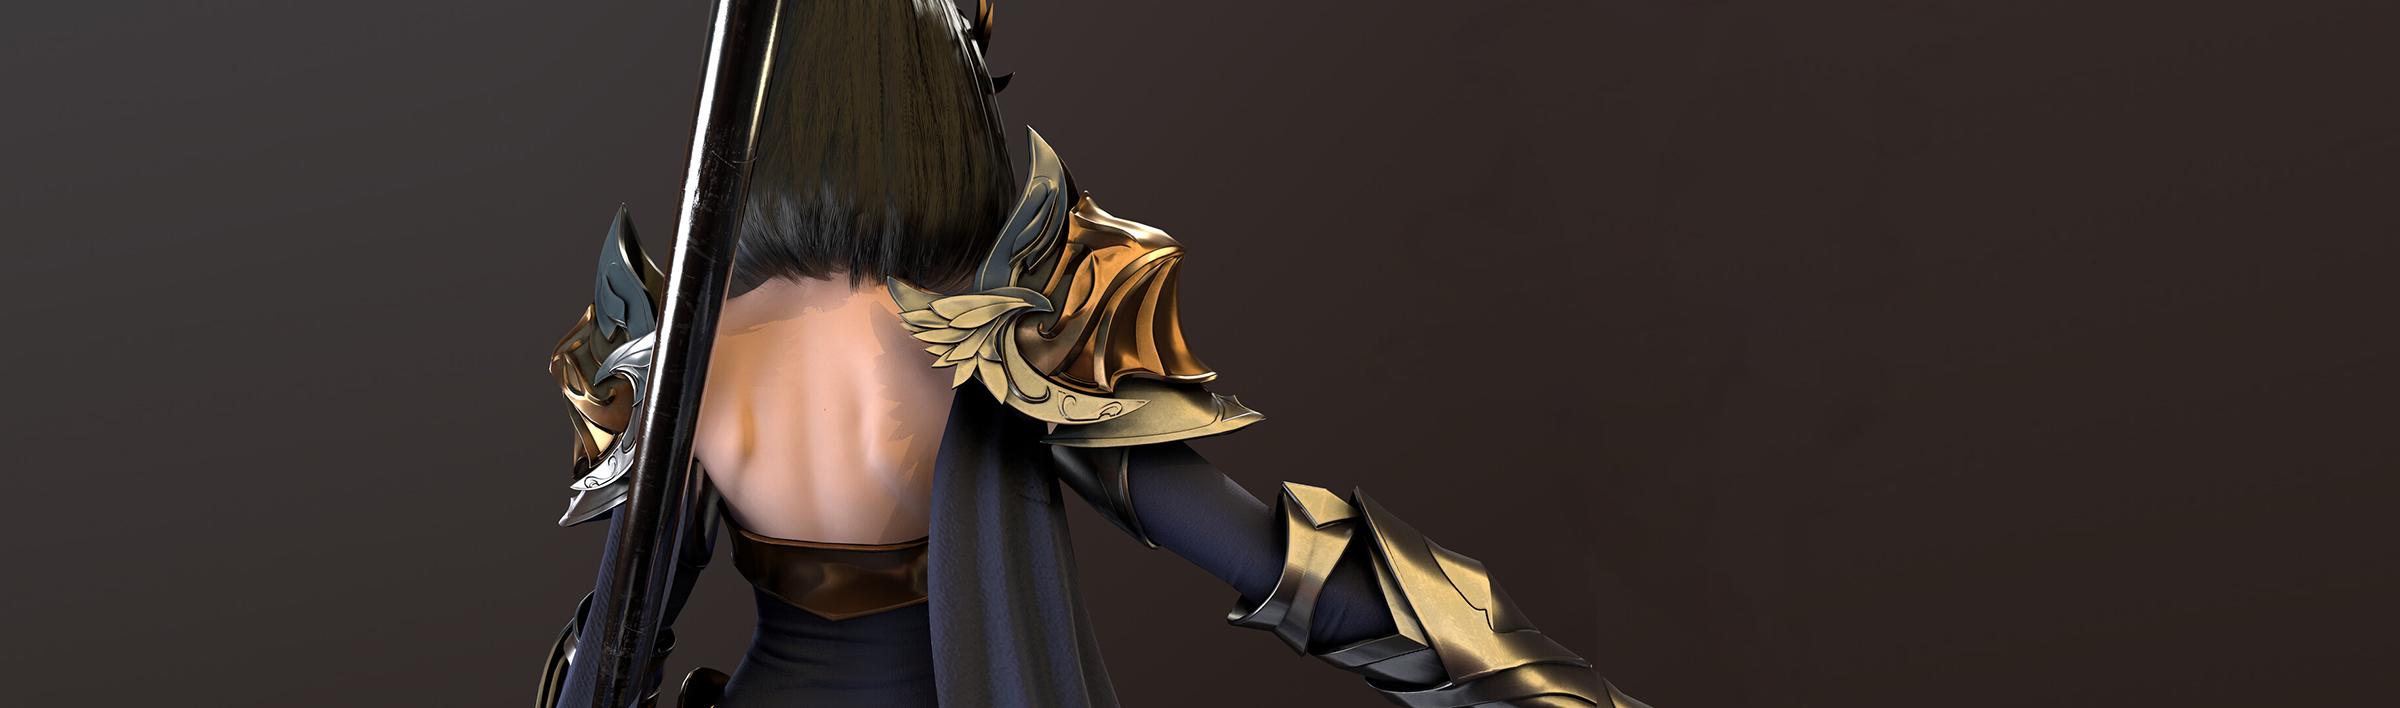 Female knight by Yuzhou Hu 04